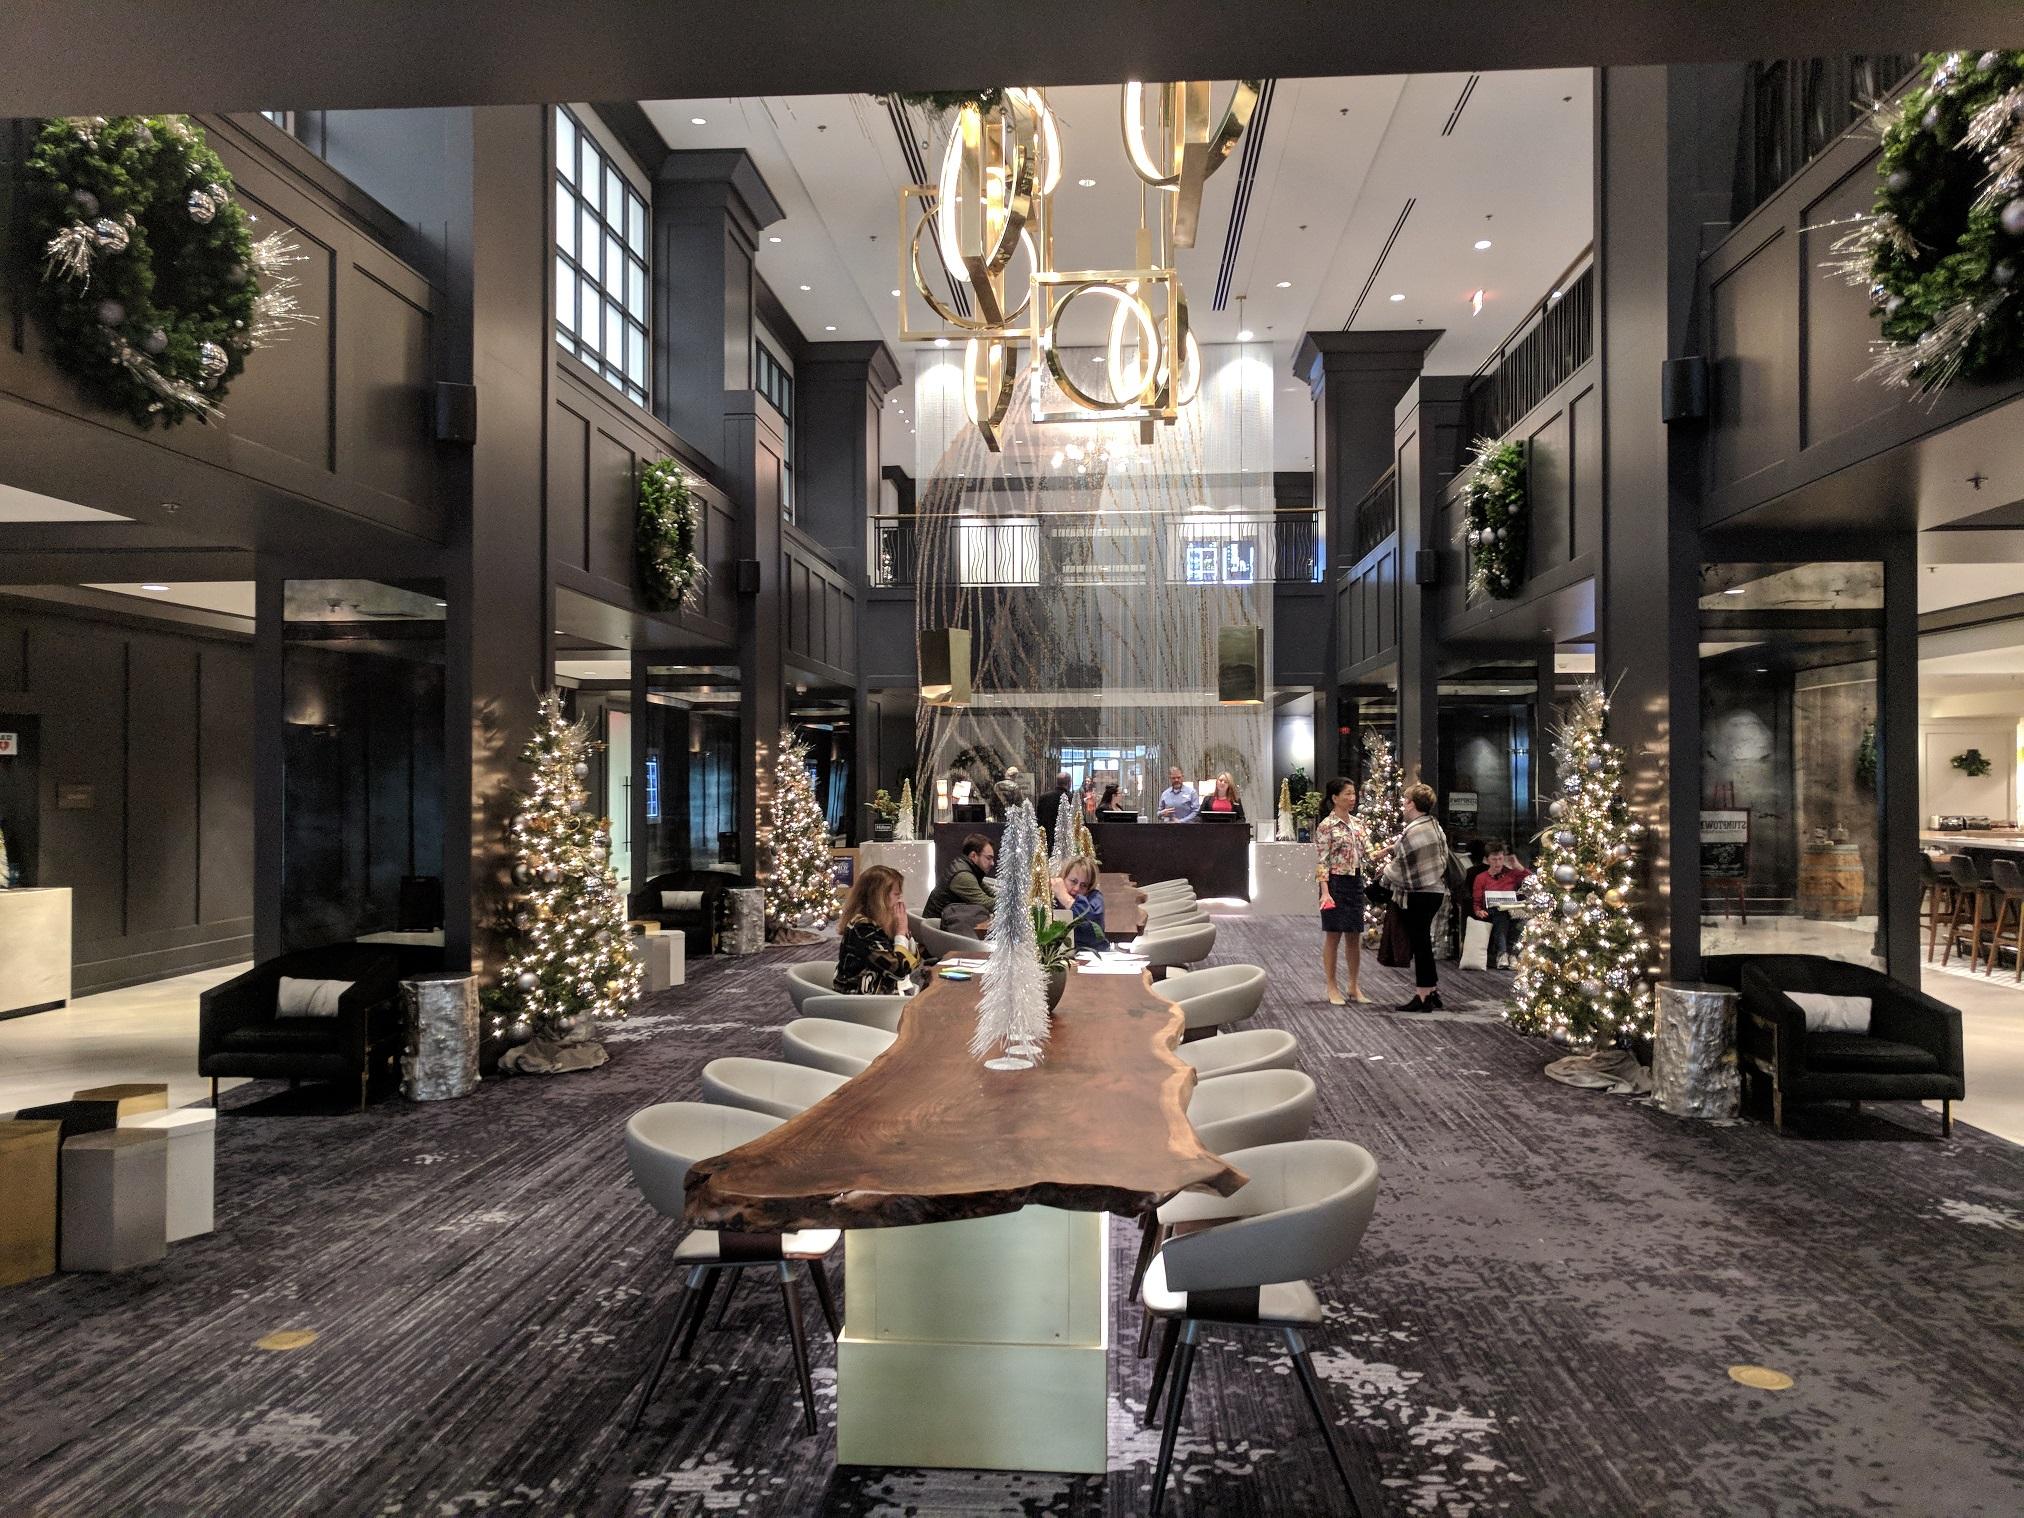 Hilton lobby xmas